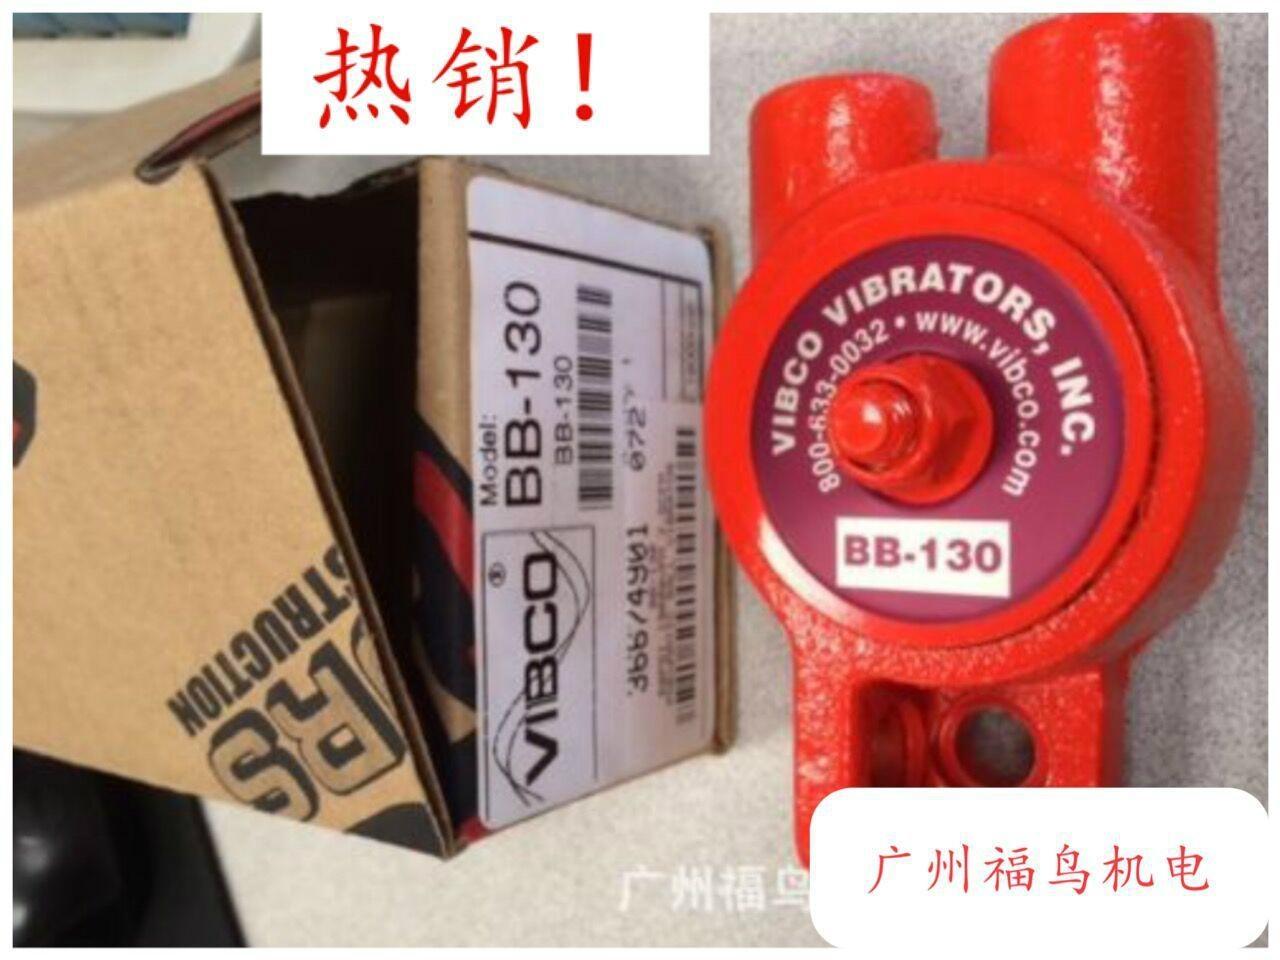 VIBCO振動器, 型號: BB-130